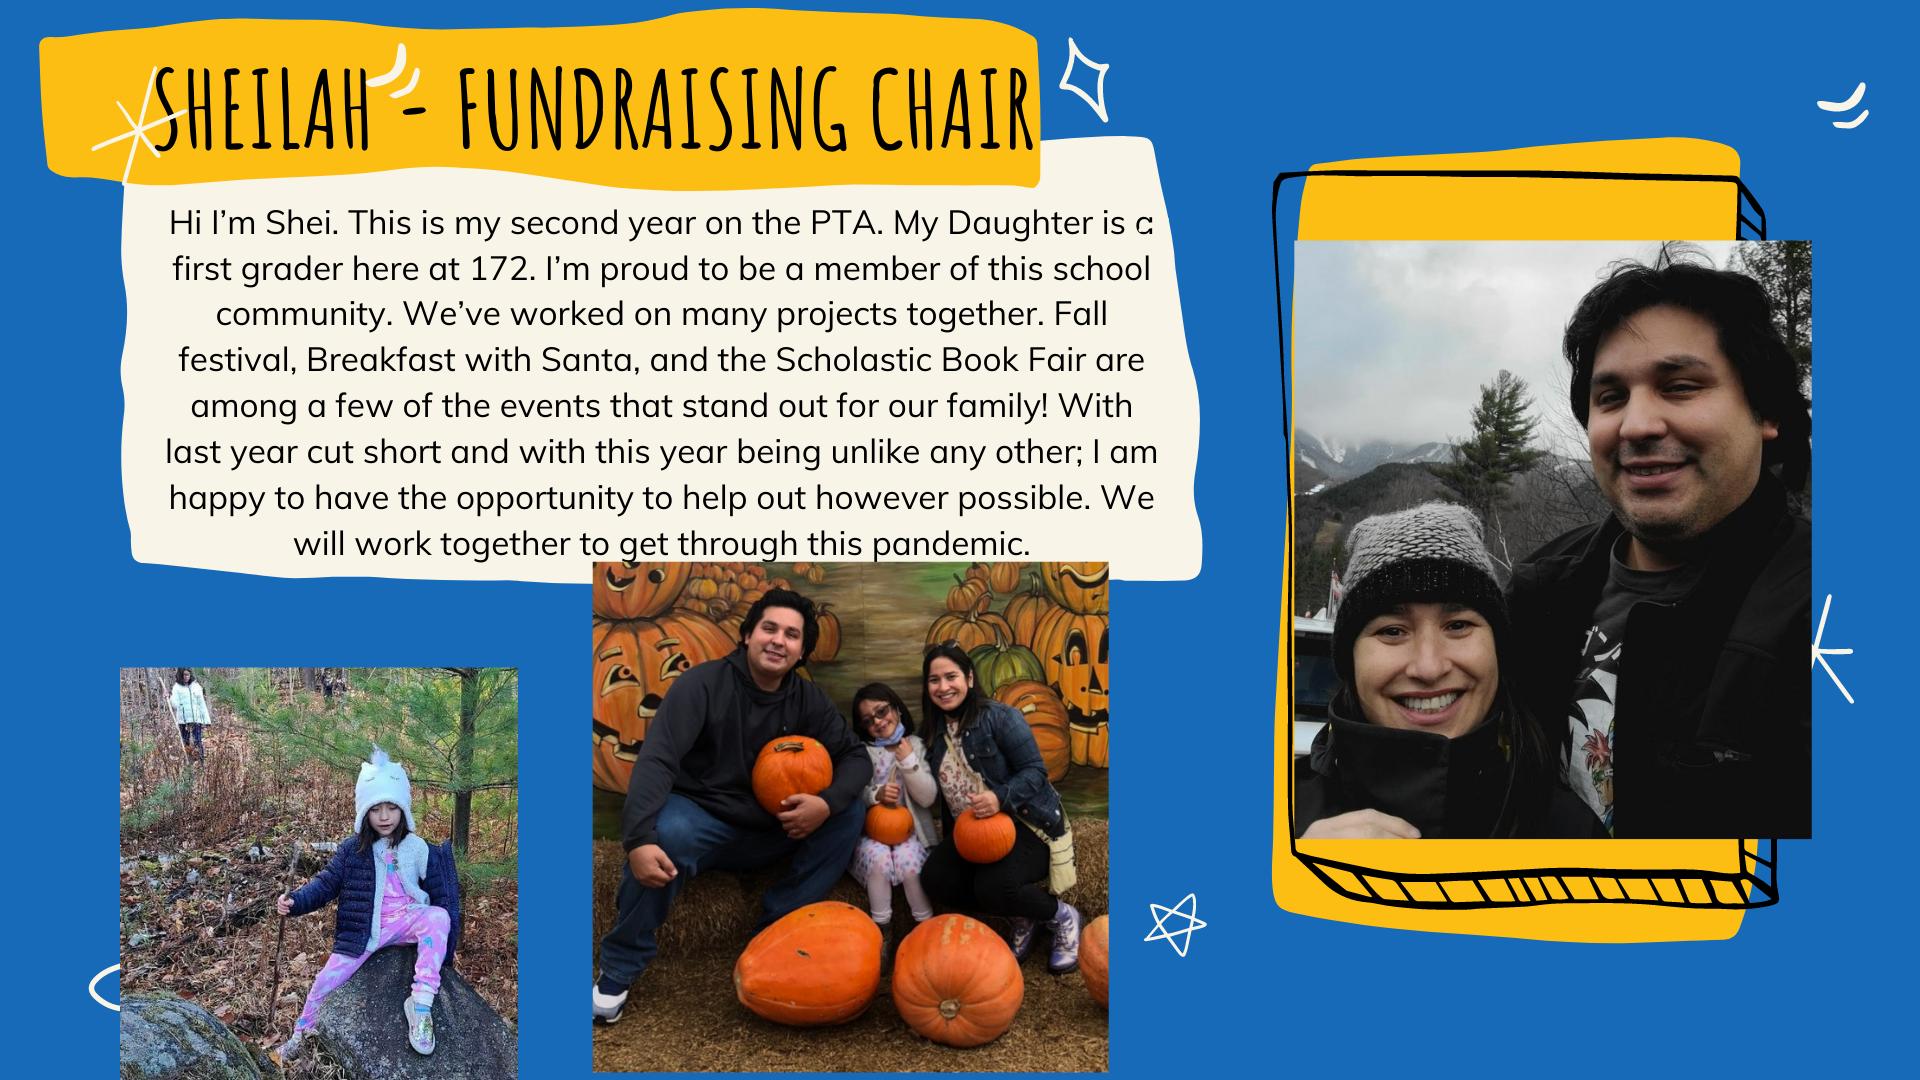 Fundraising Chairperson - Sheilah Dejesus-Calderon